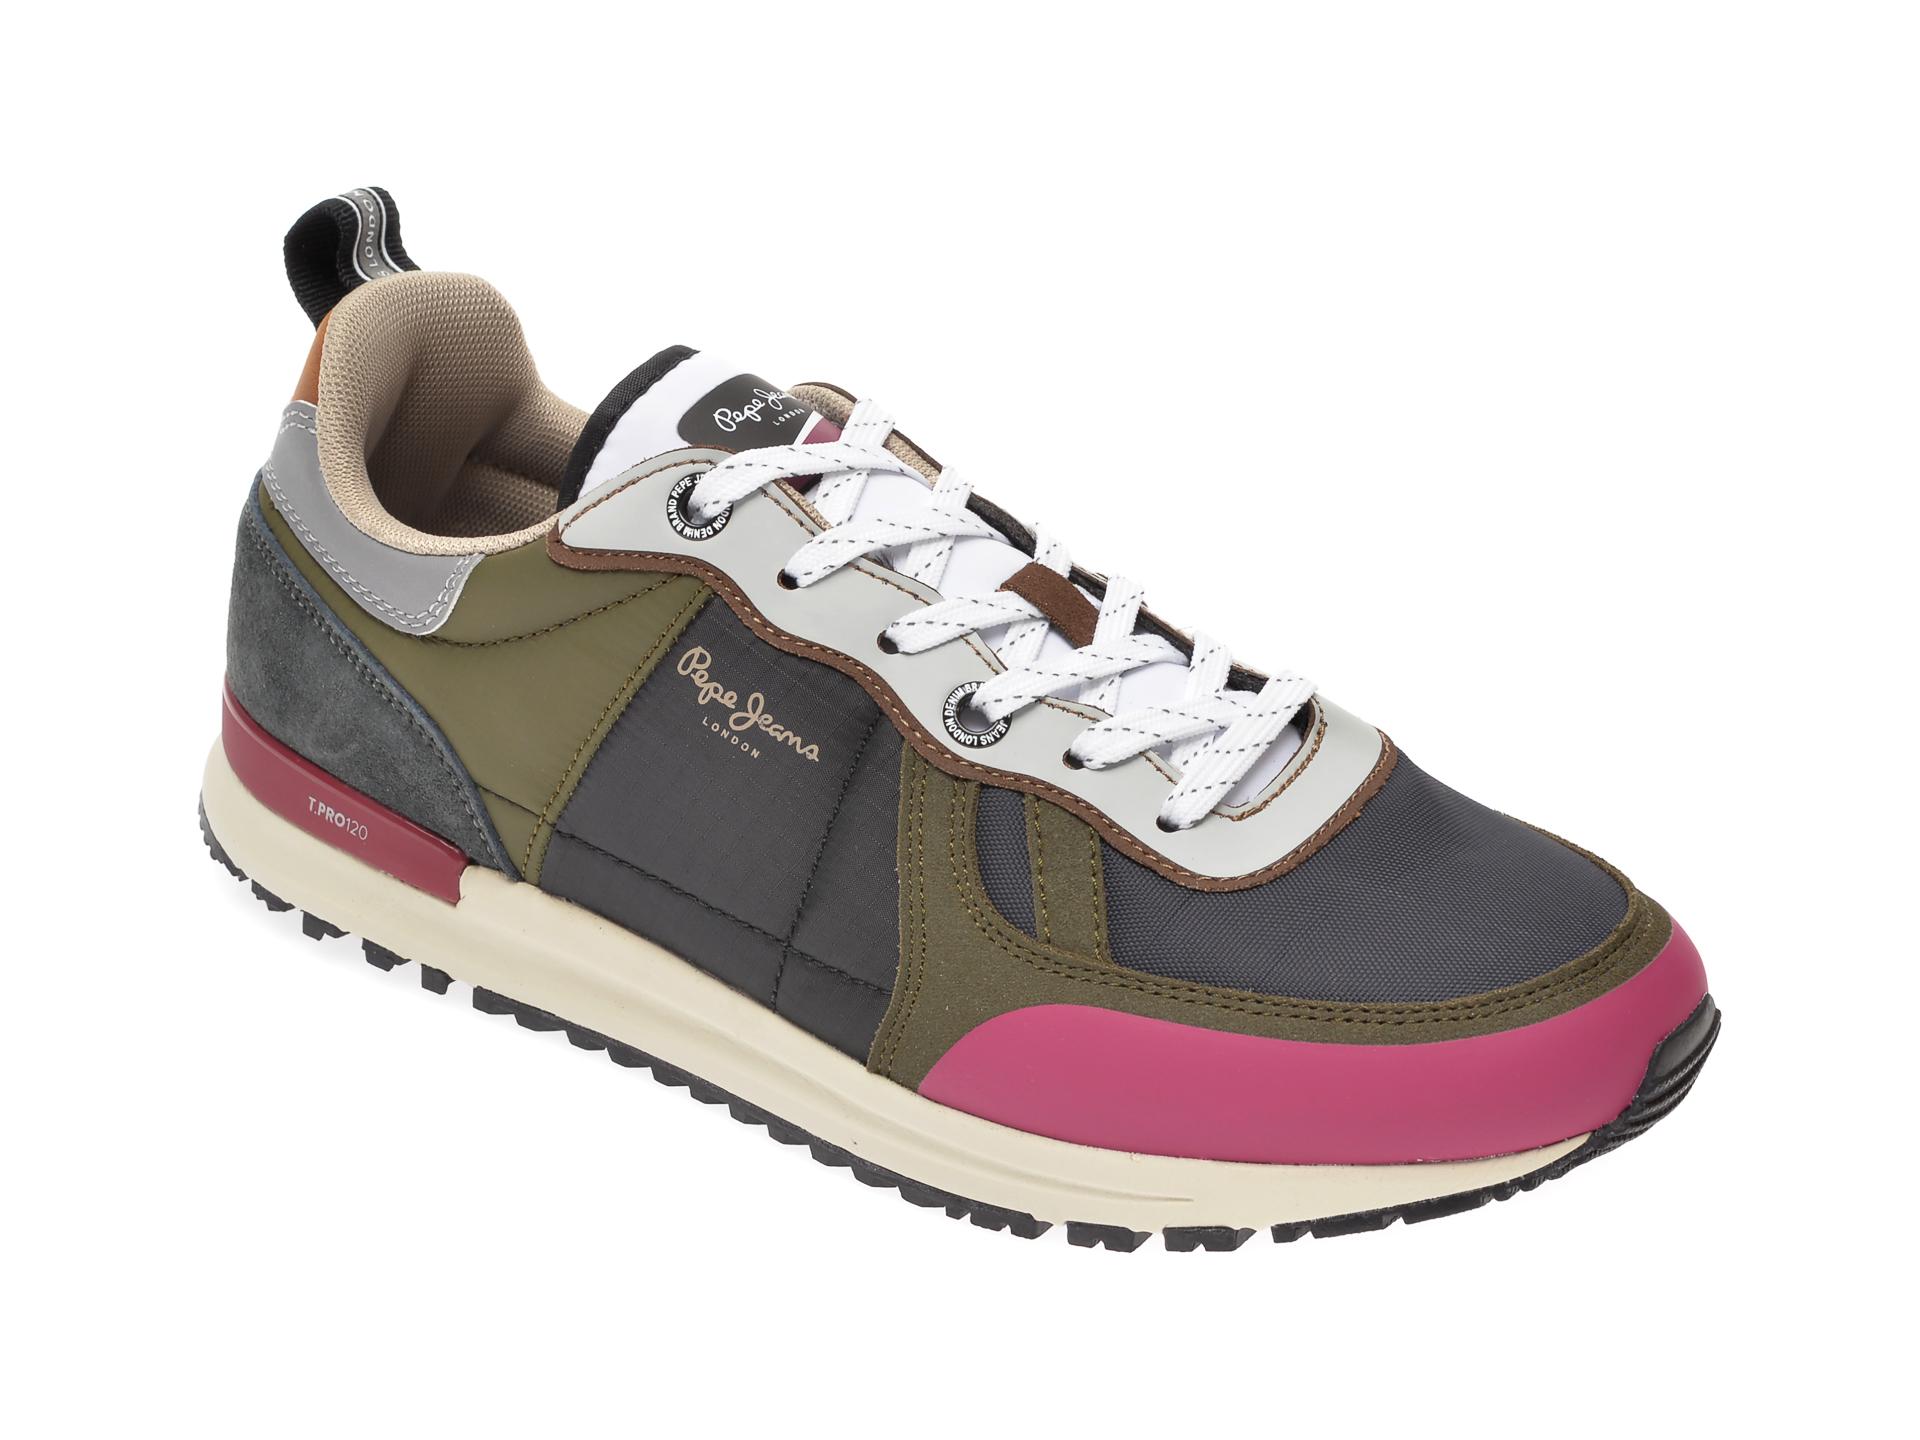 Pantofi sport PEPE JEANS kaki, MS30622, din material textil si piele ecologica imagine